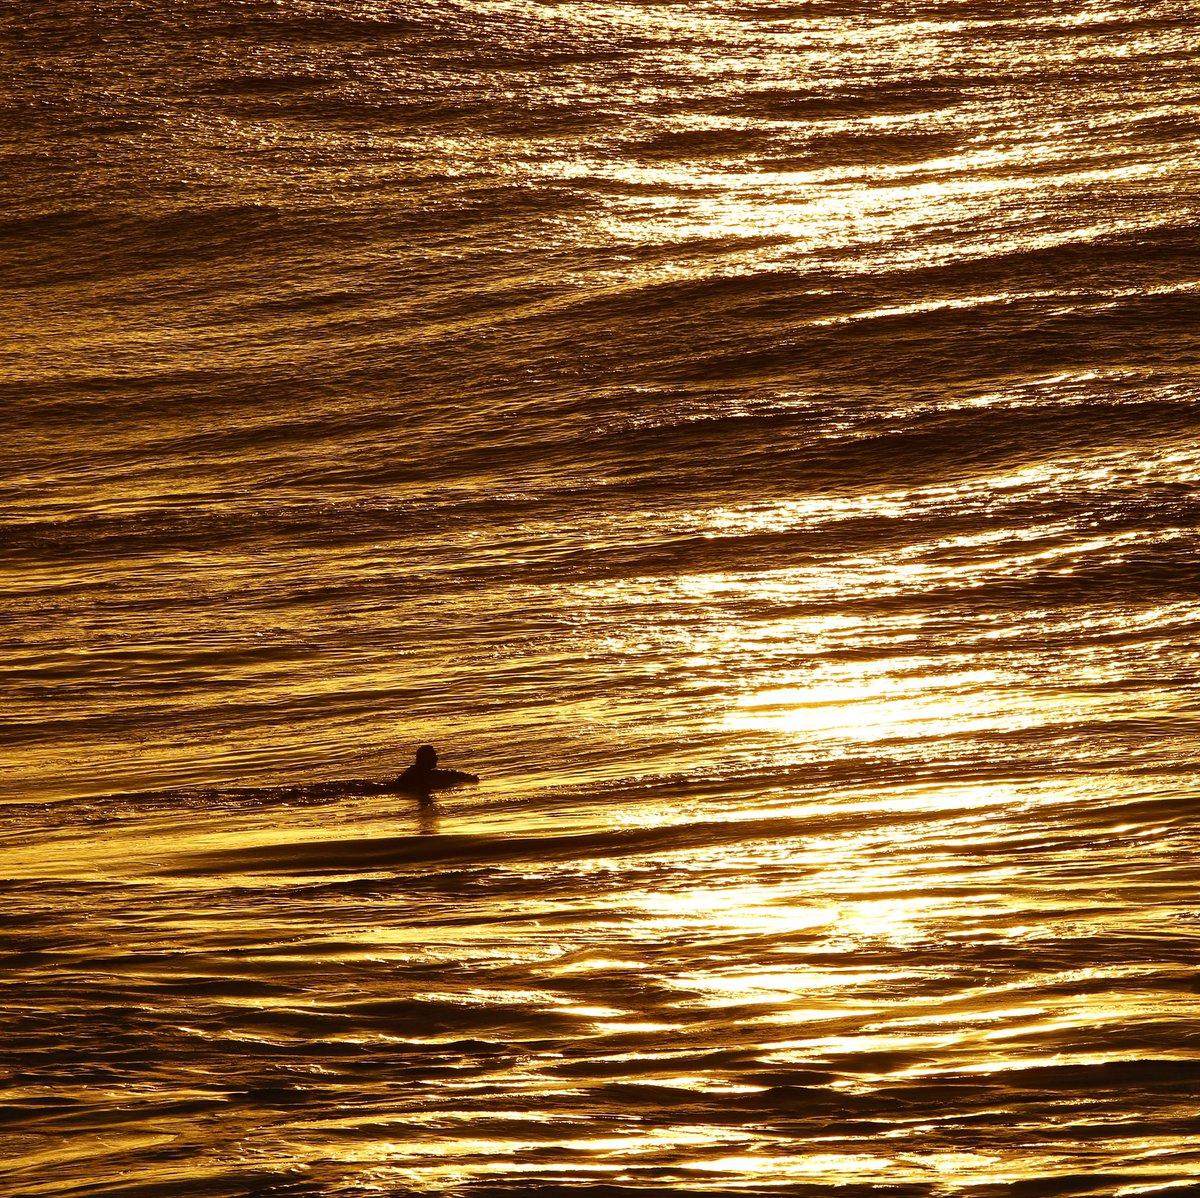 Paddling through liquid Gold... Nature is such a Beauty 🌊💛 https://t.co/LxOzjG8AnE